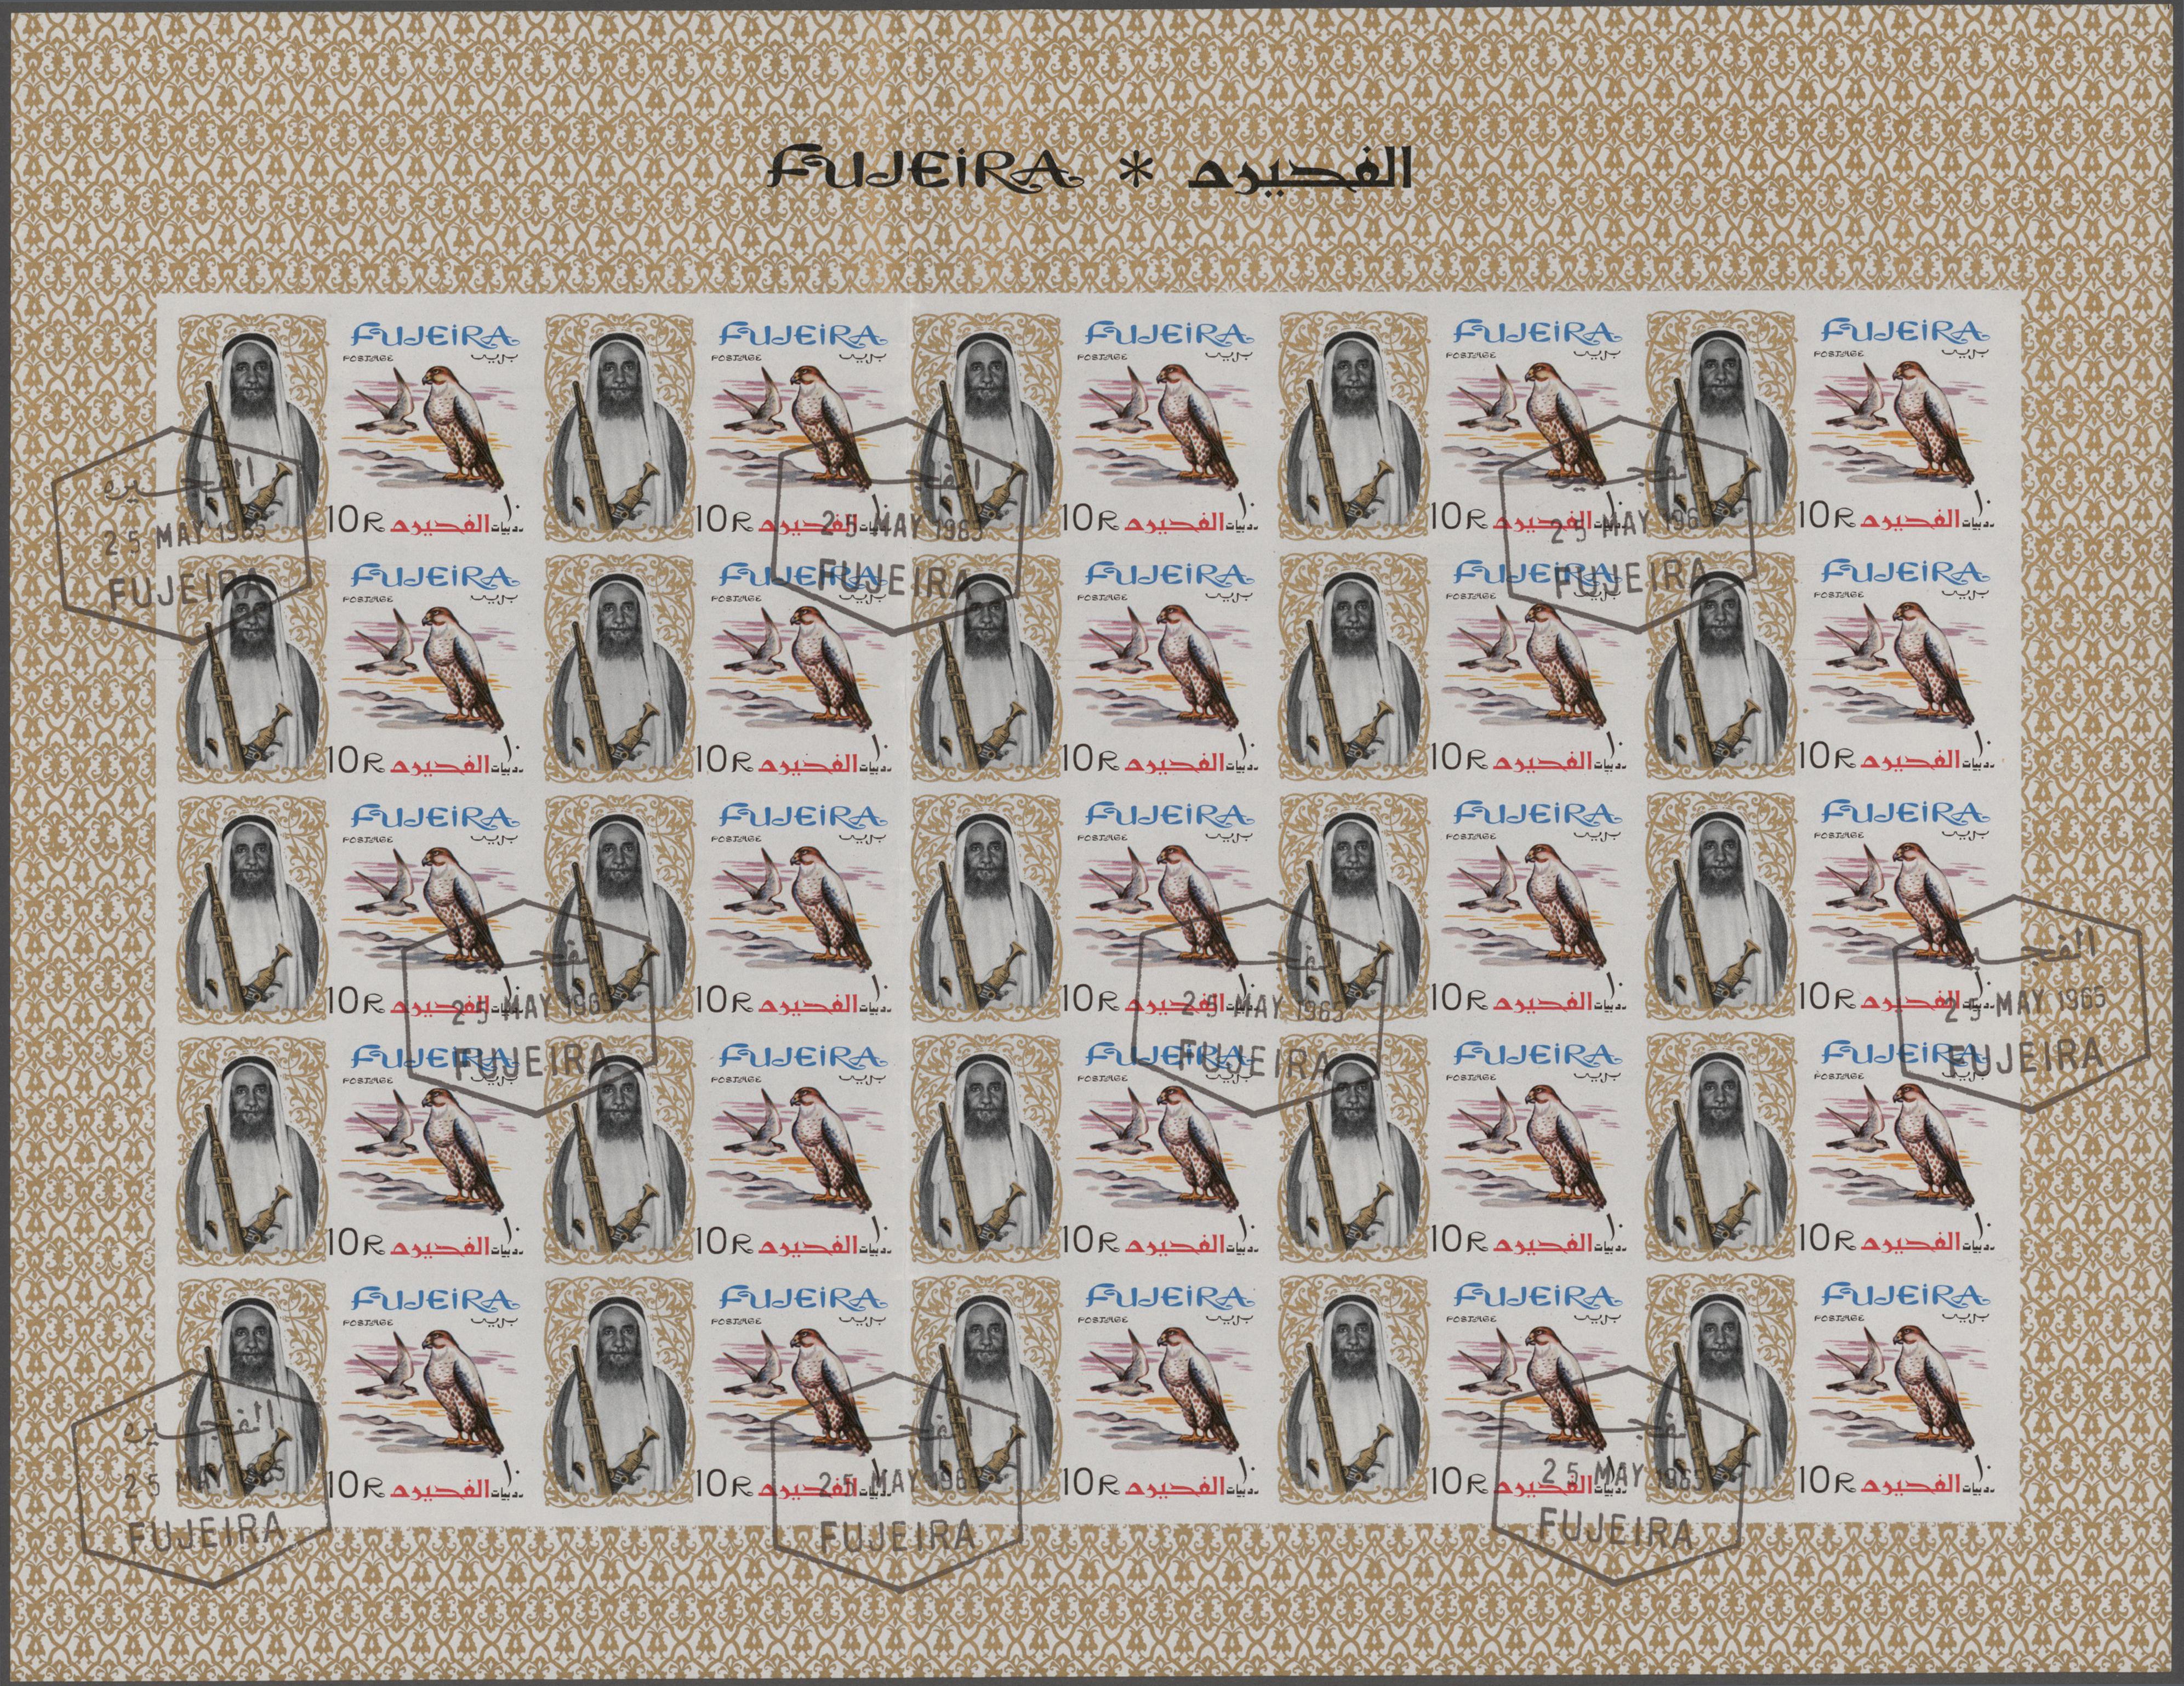 Lot 20648 - Fudschaira / Fujeira  -  Auktionshaus Christoph Gärtner GmbH & Co. KG Sale #46 Collections Worldwide